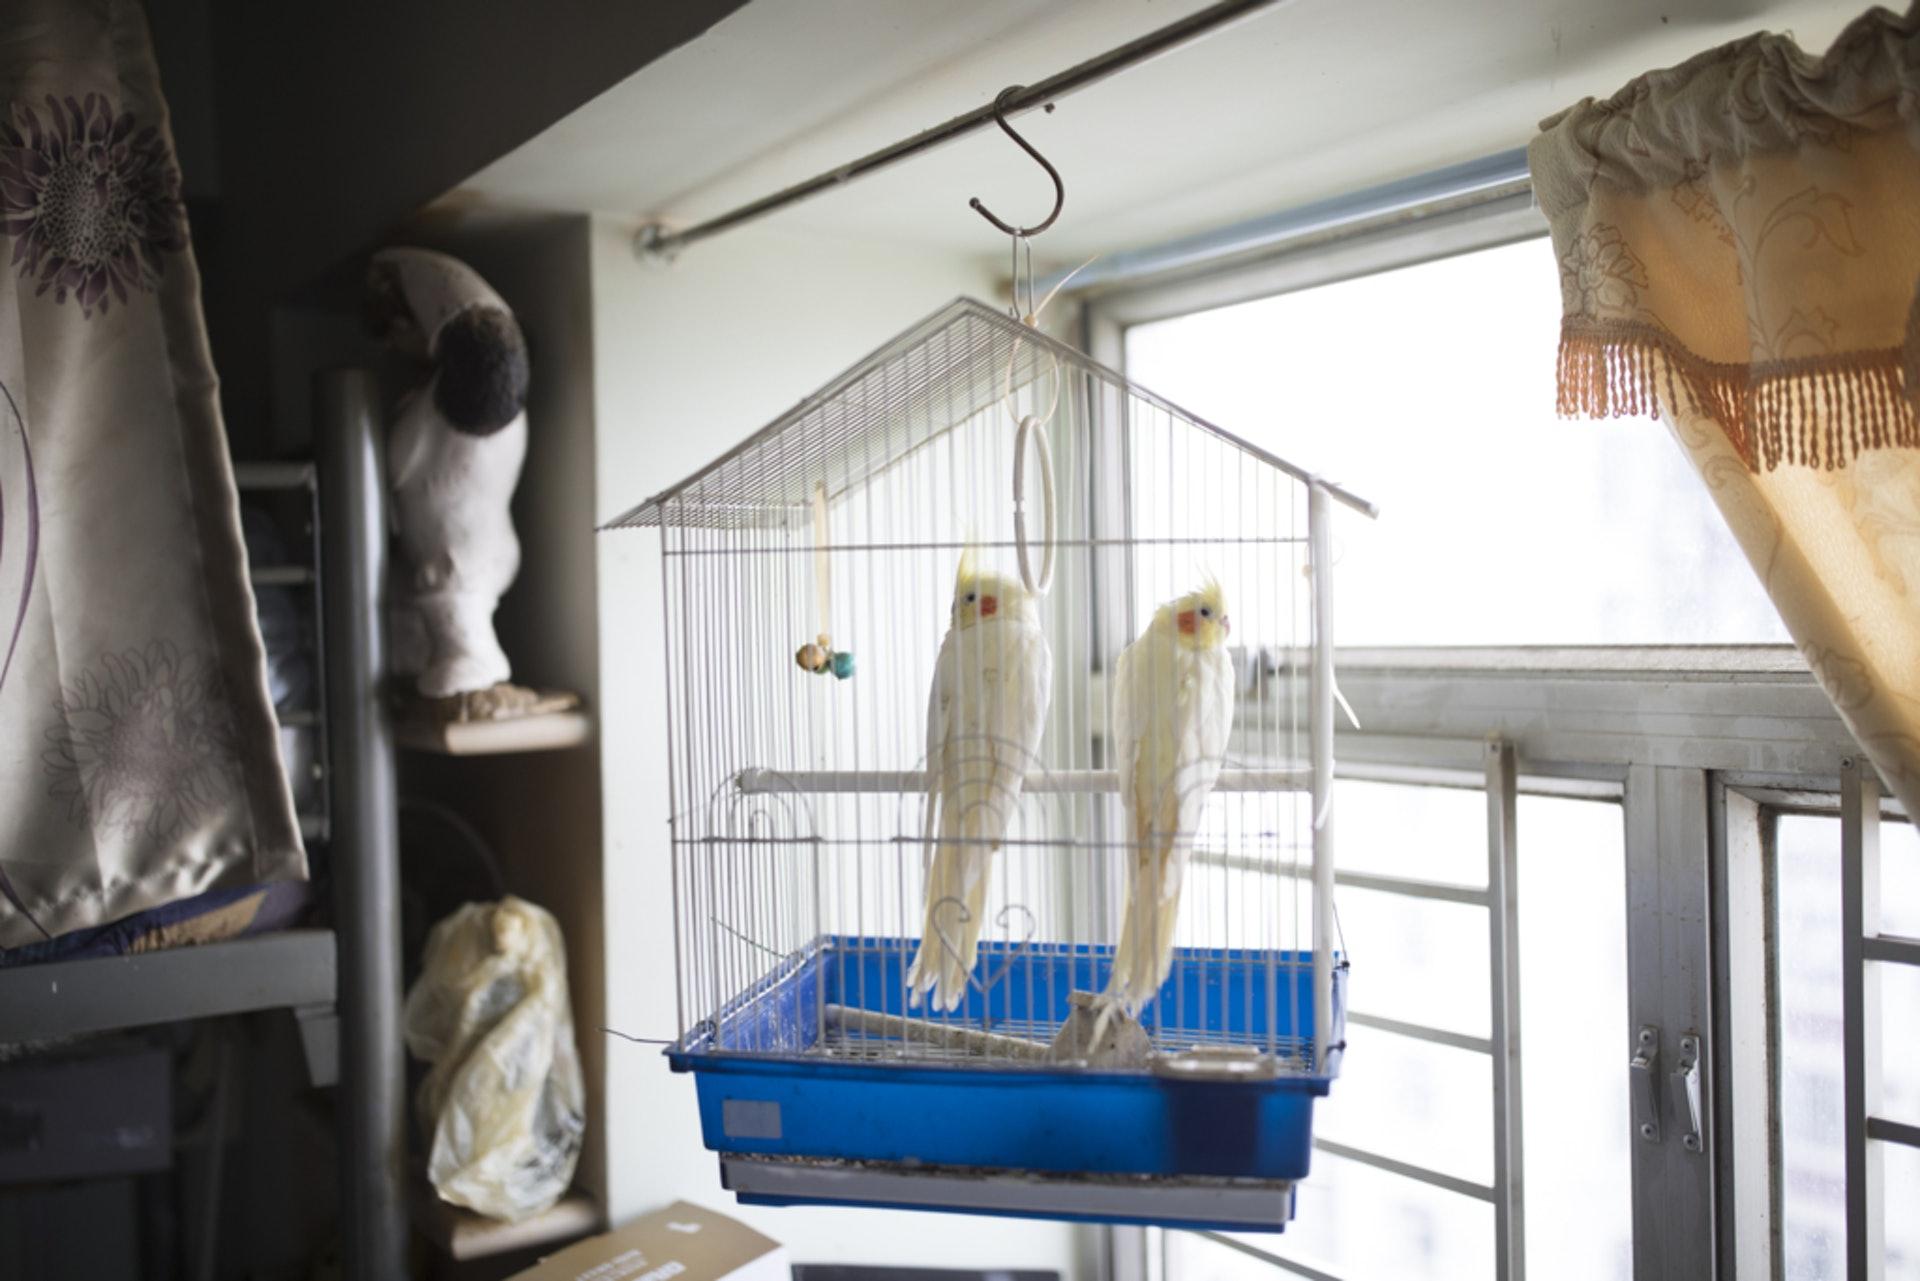 Carmen家中有貓有狗有鸚鵡。這一對鸚鵡,是男友怕她因撞窗而死掉的流浪小鳥而傷心、於是送她的禮物。(攝:余俊亮)